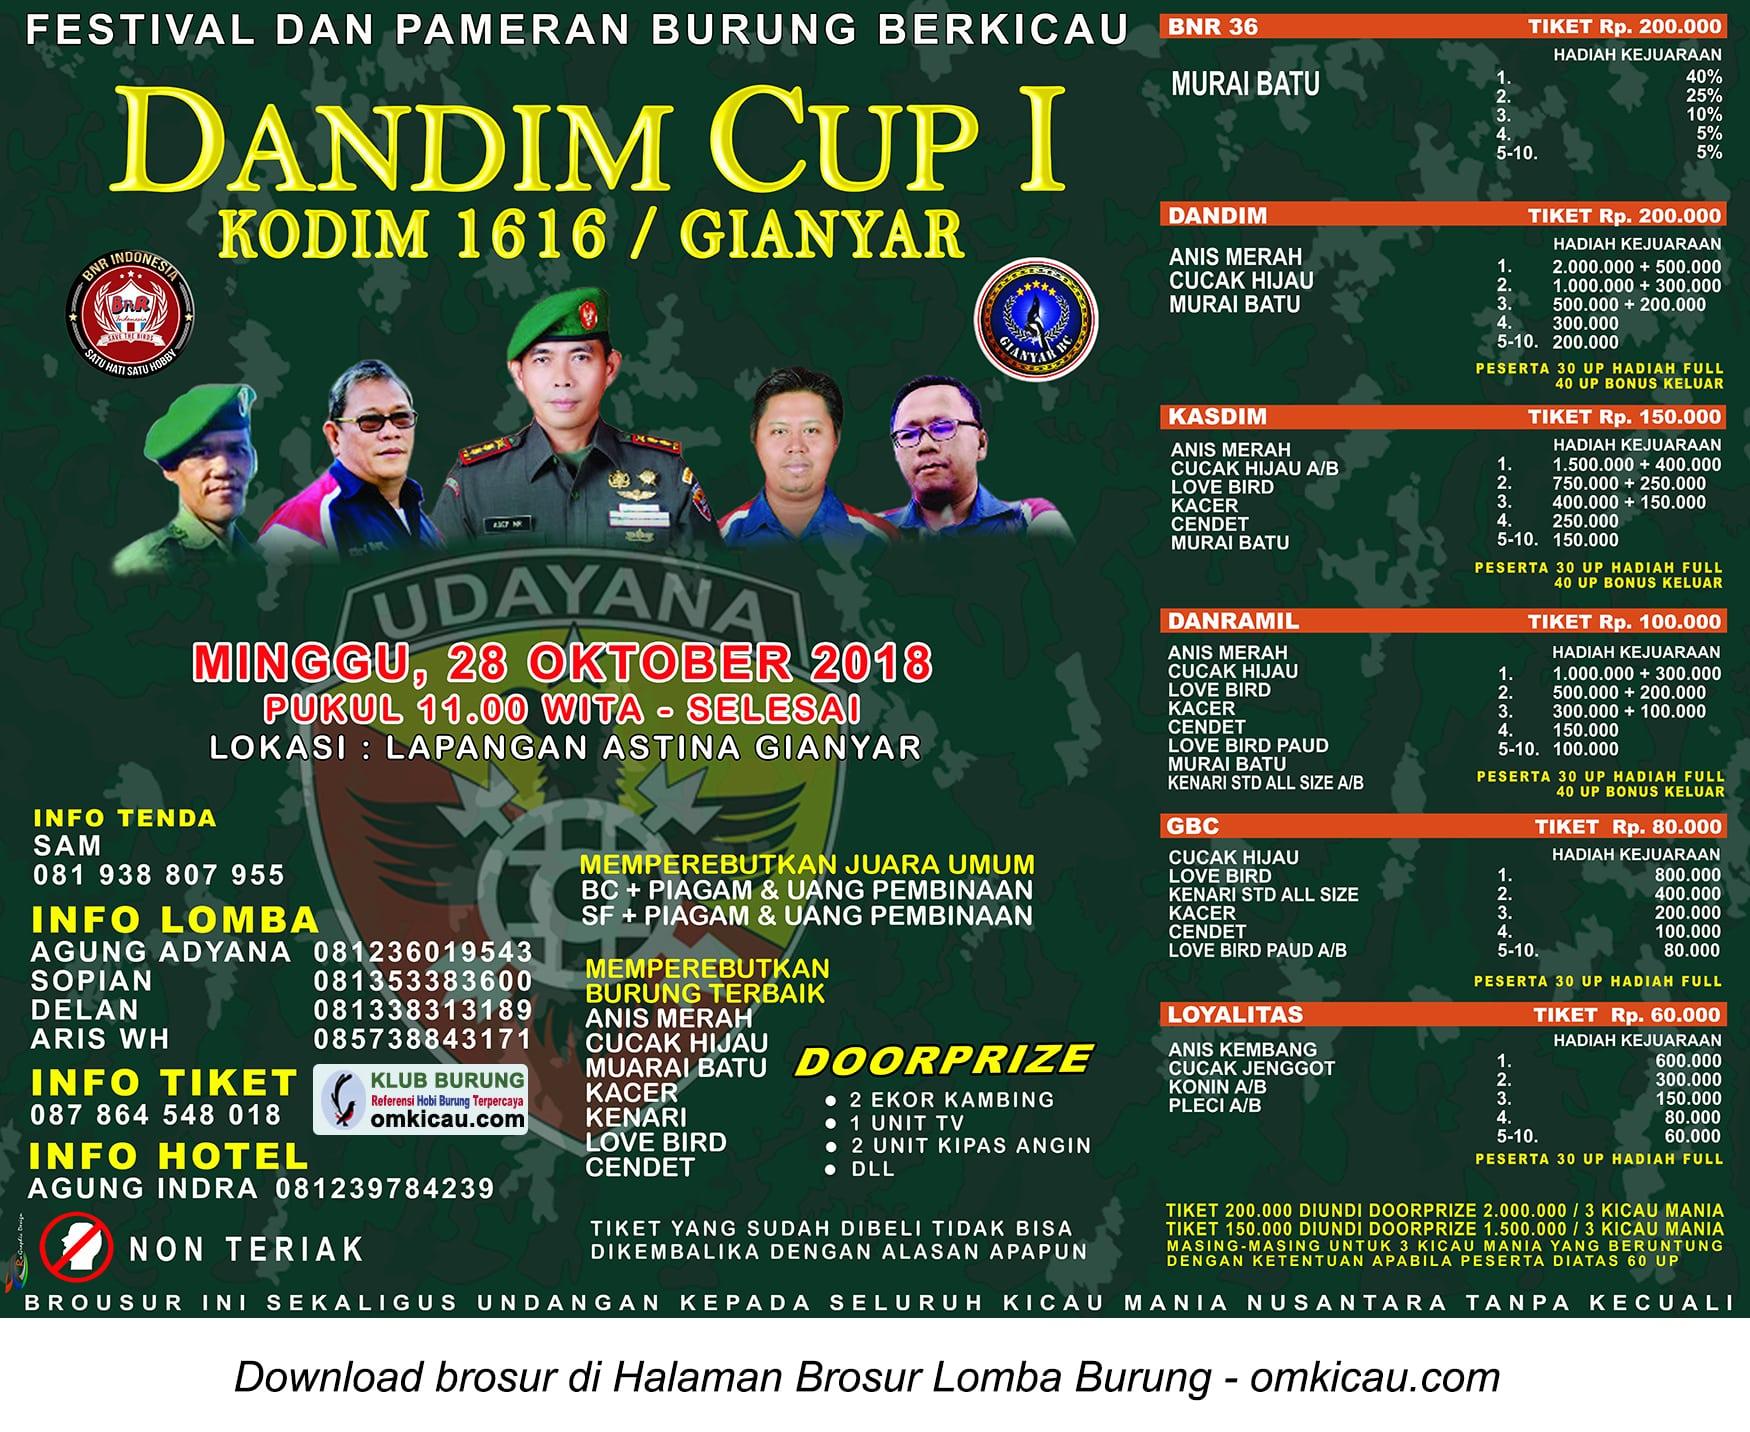 Dandim Cup I Gianyar